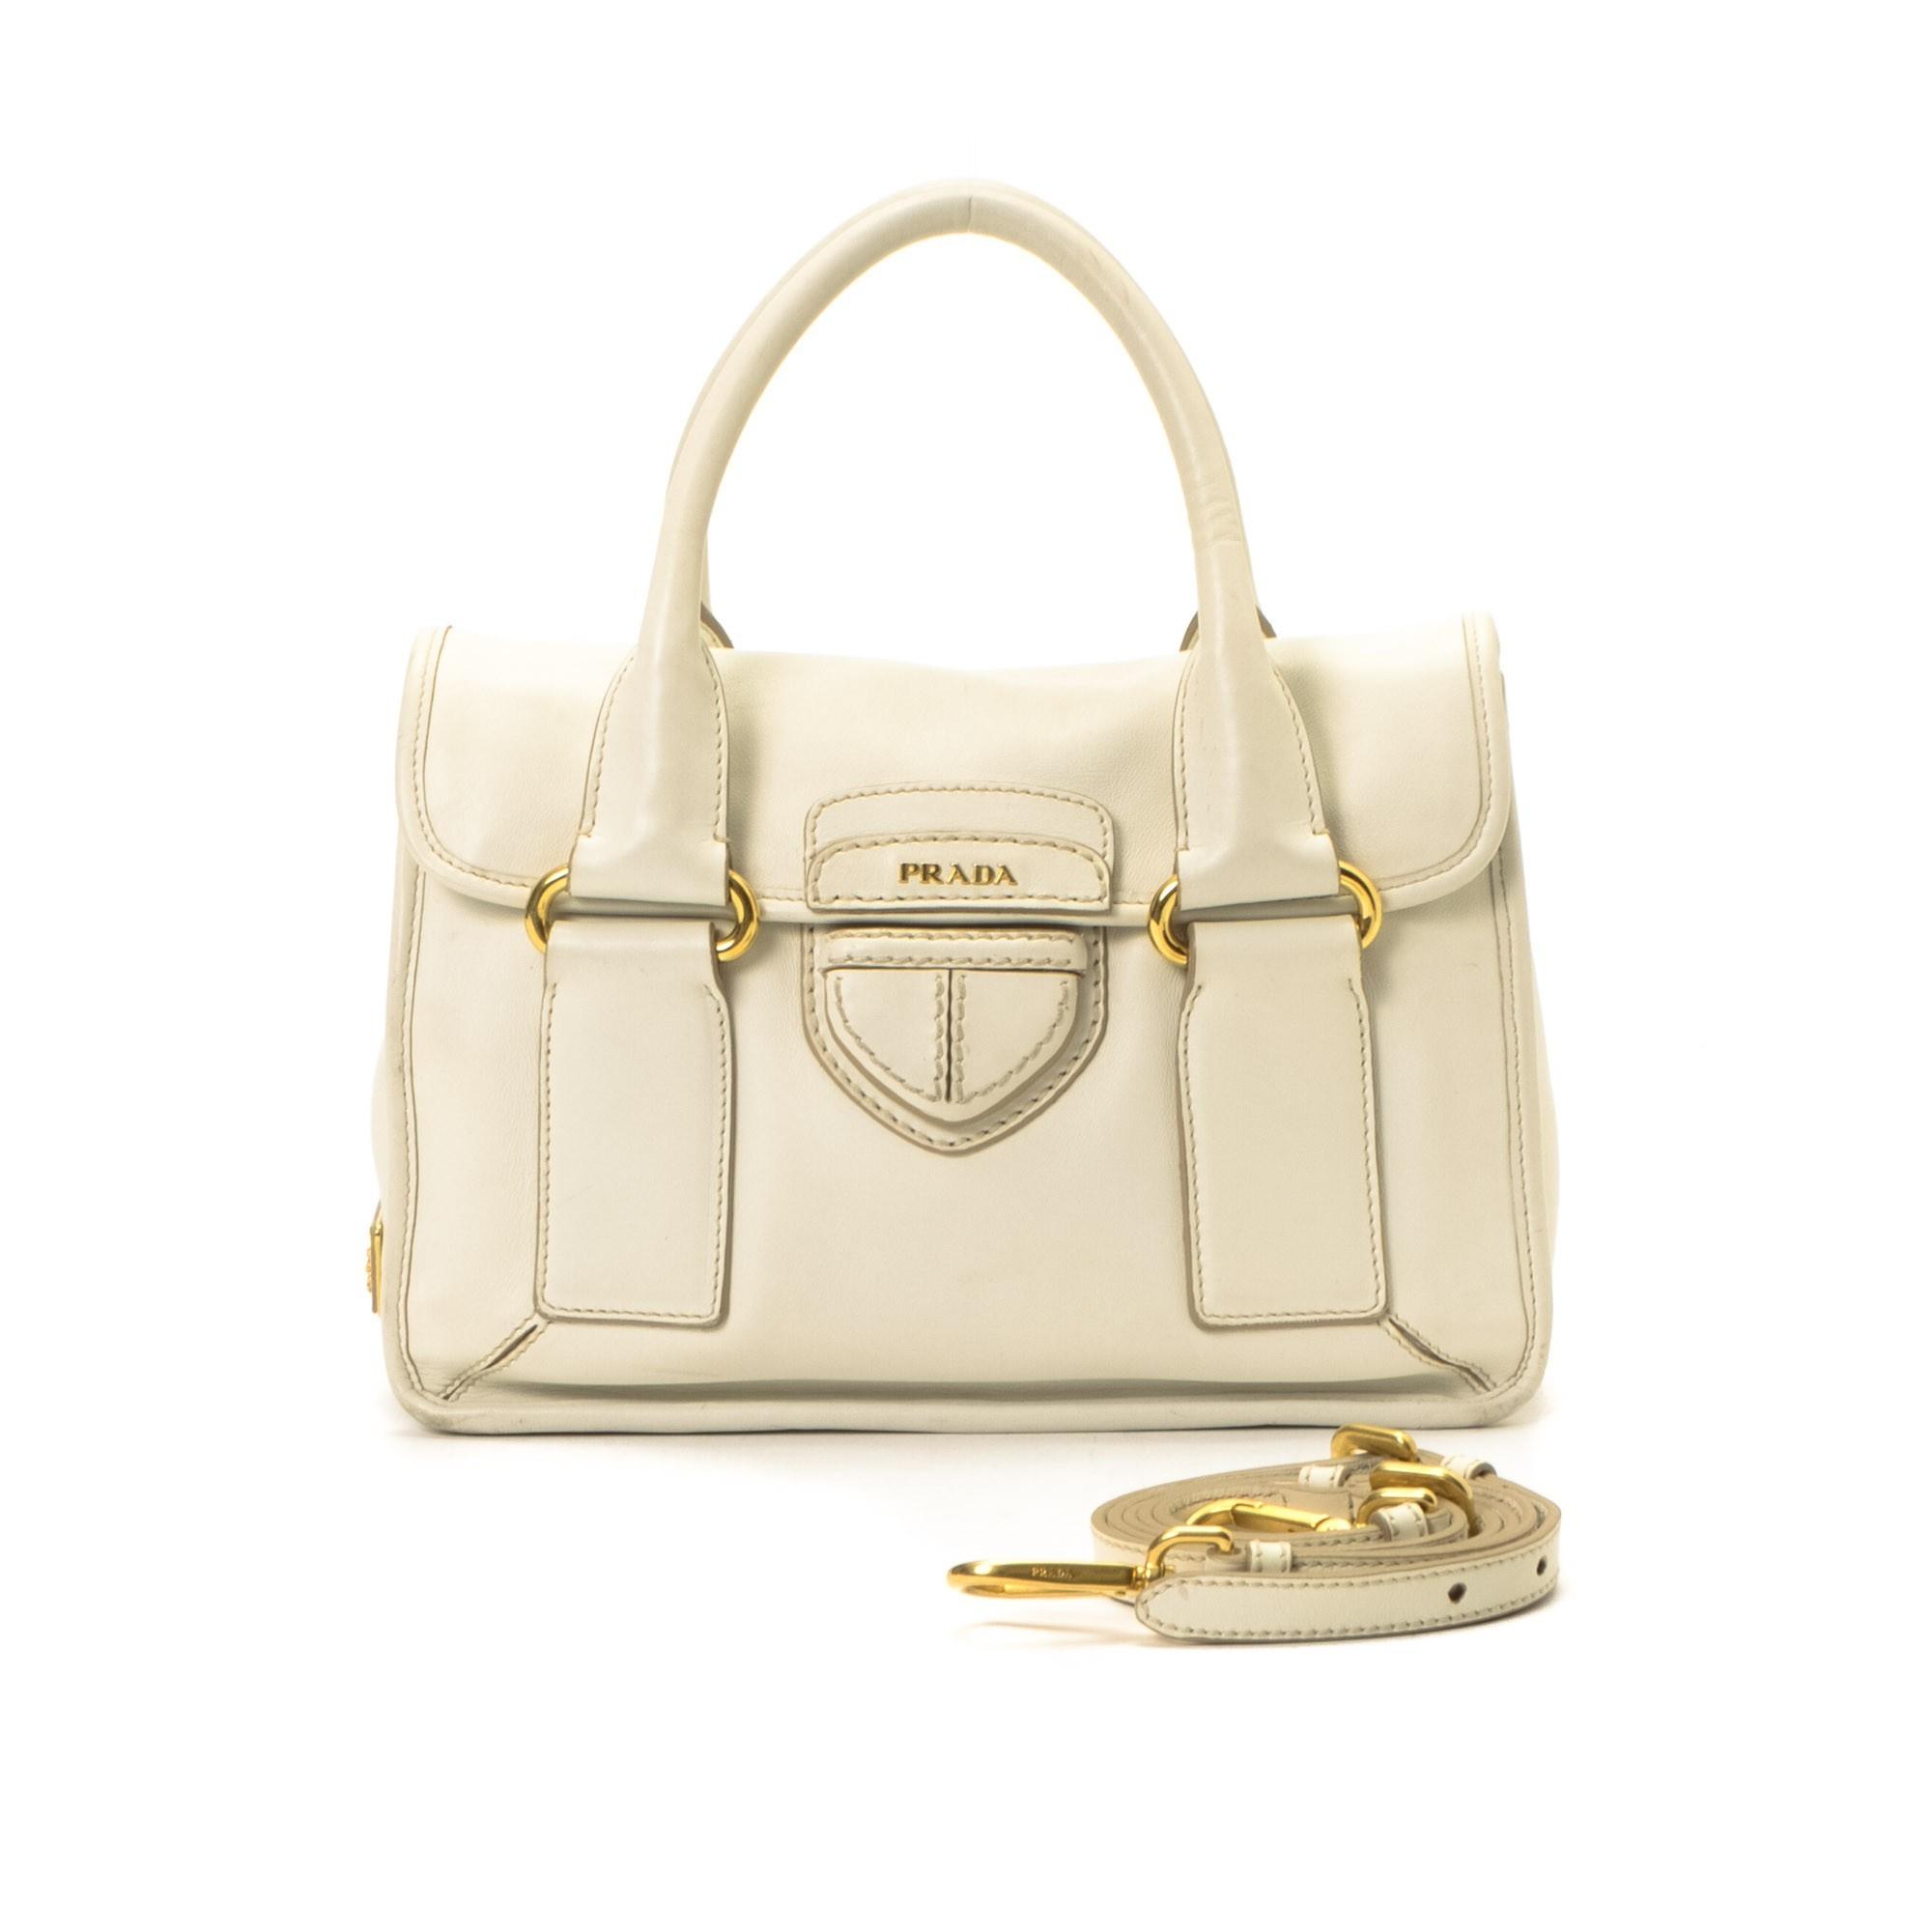 prada purse cost - Prada Two Way Bag White Leather Handbag - LXR&CO Vintage Luxury